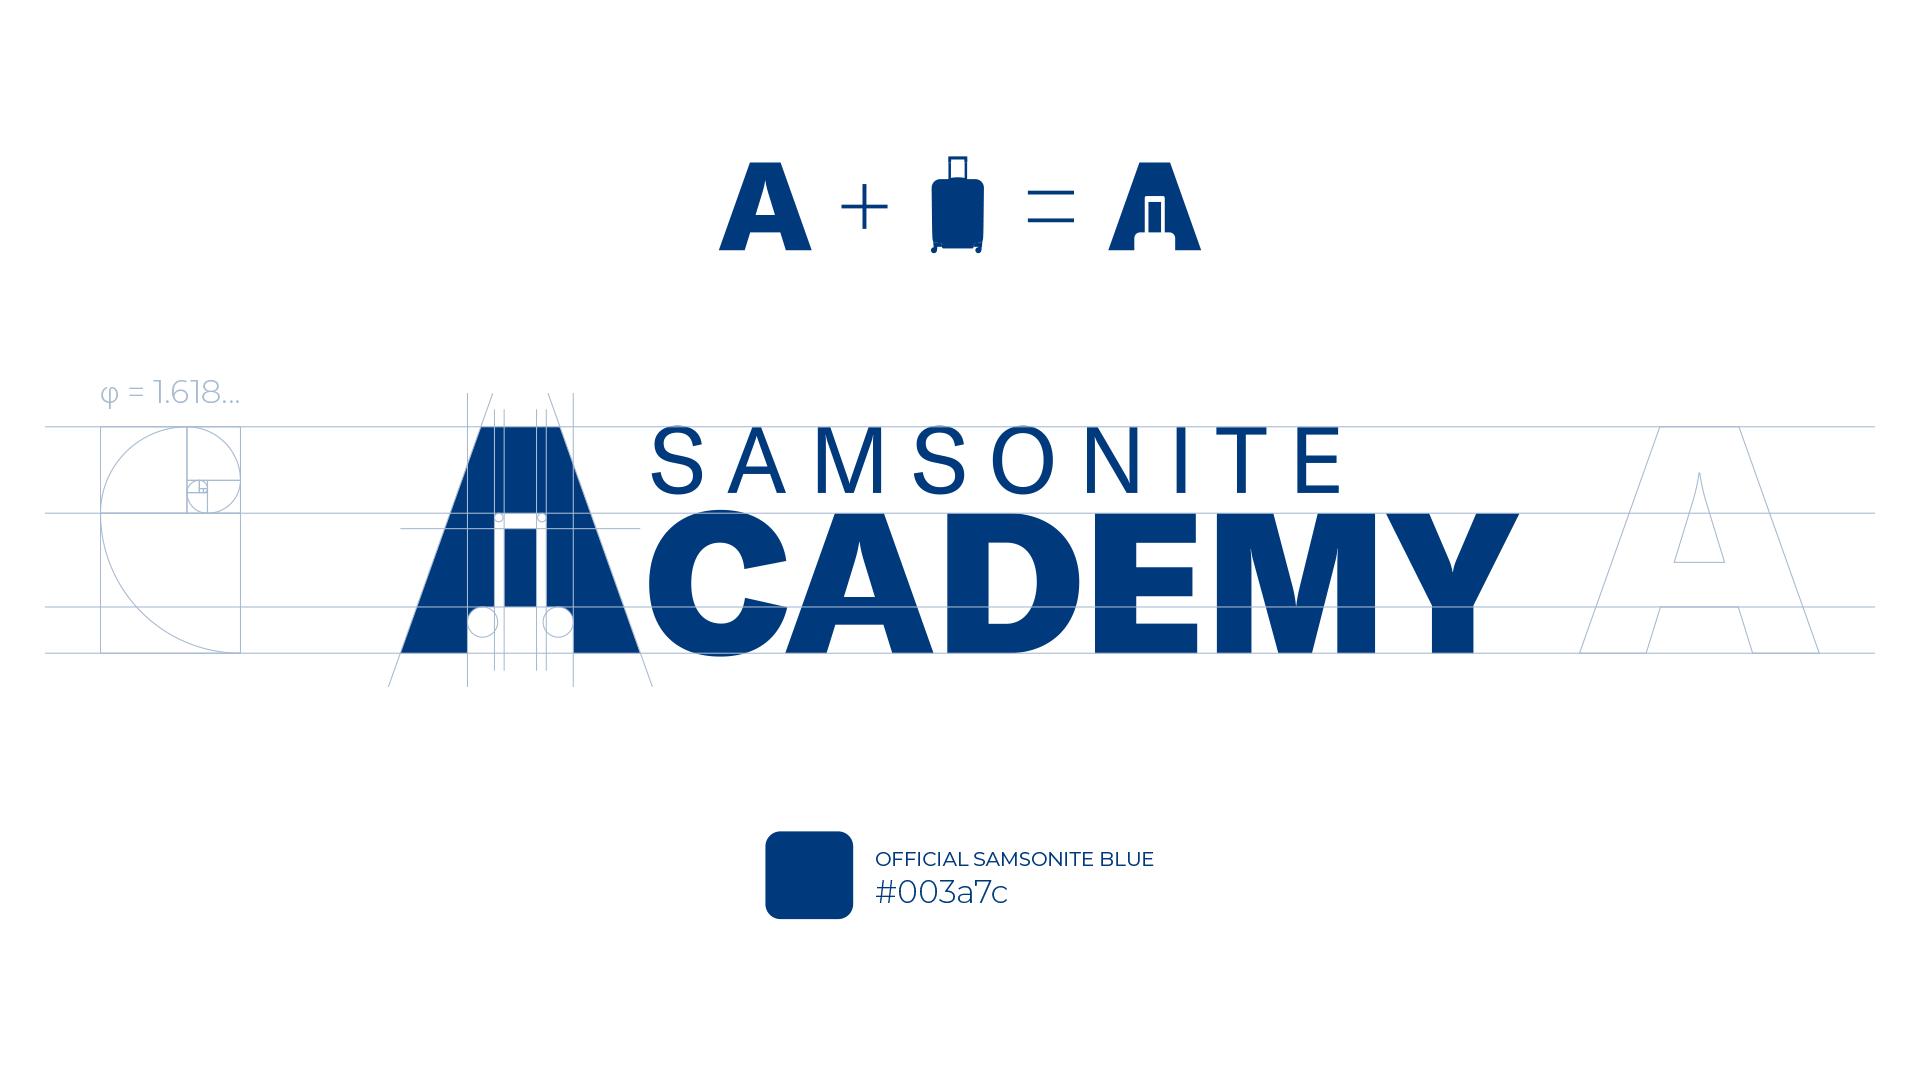 Samsonite Academy logo grid